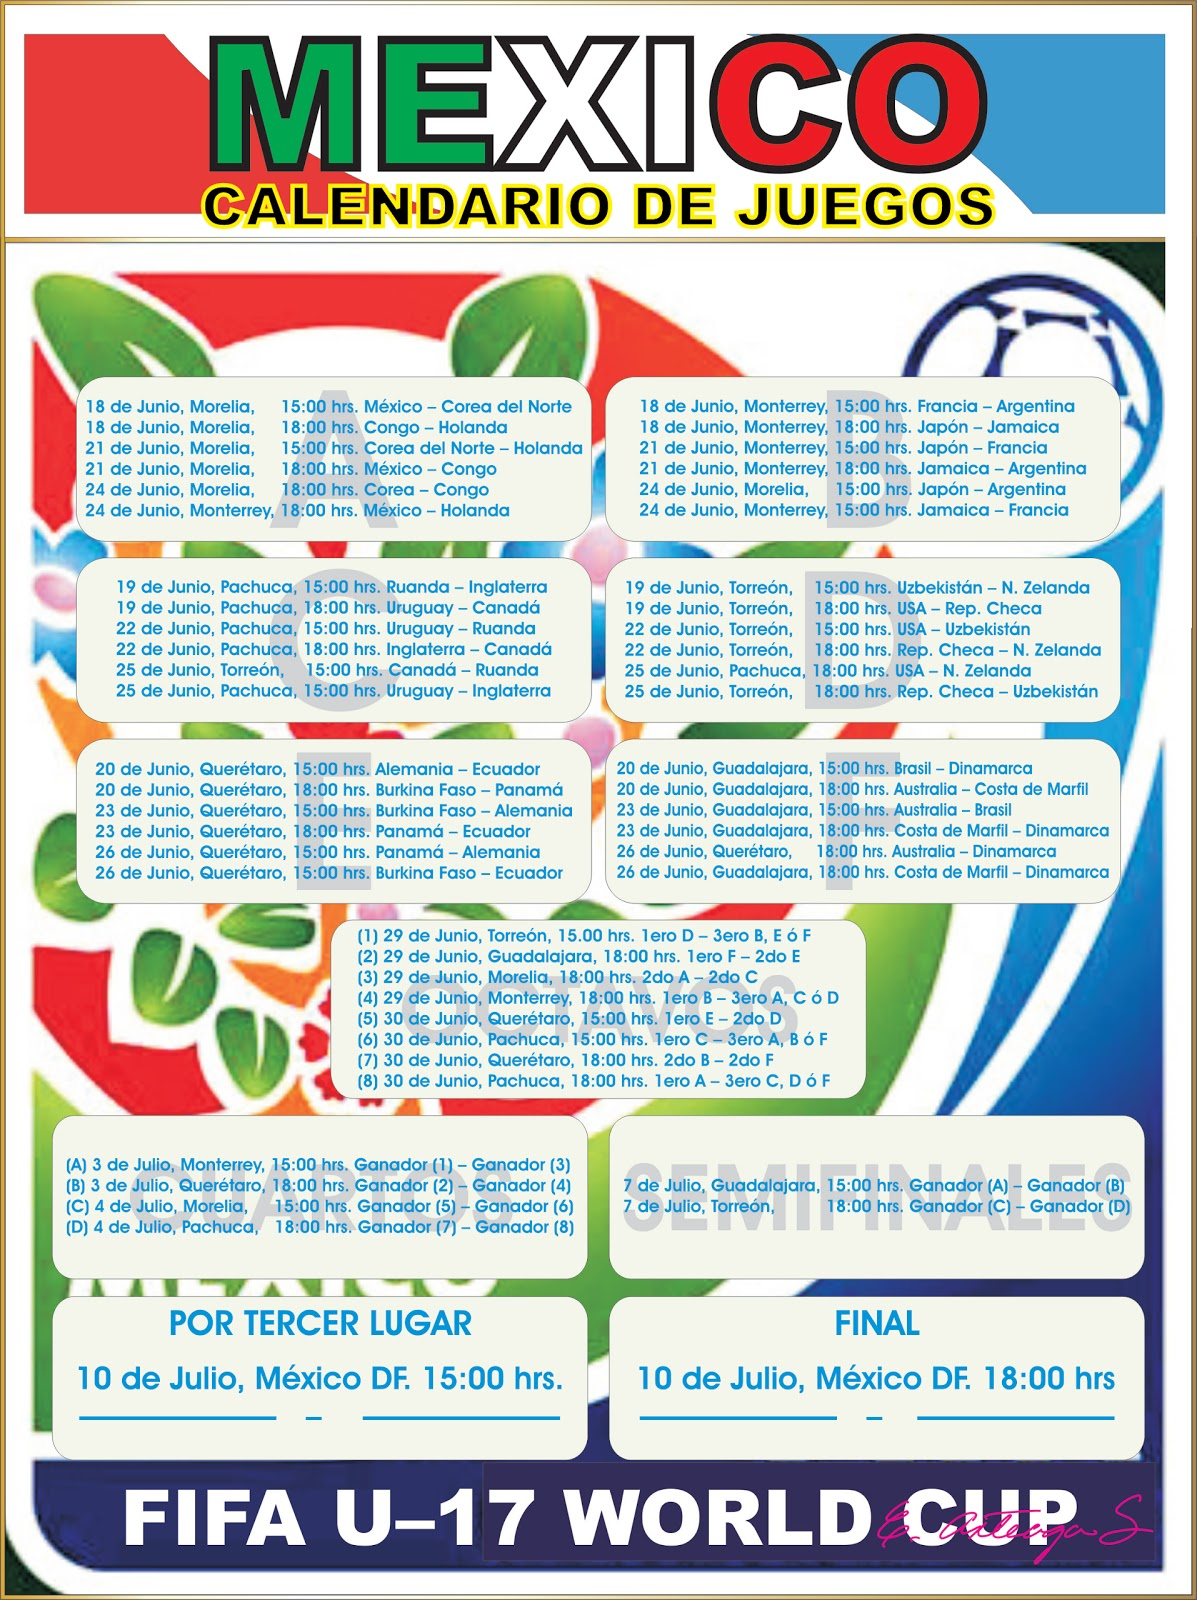 Calendario De Juegos De Tigres 2016 | Search Results | Calendar 2015